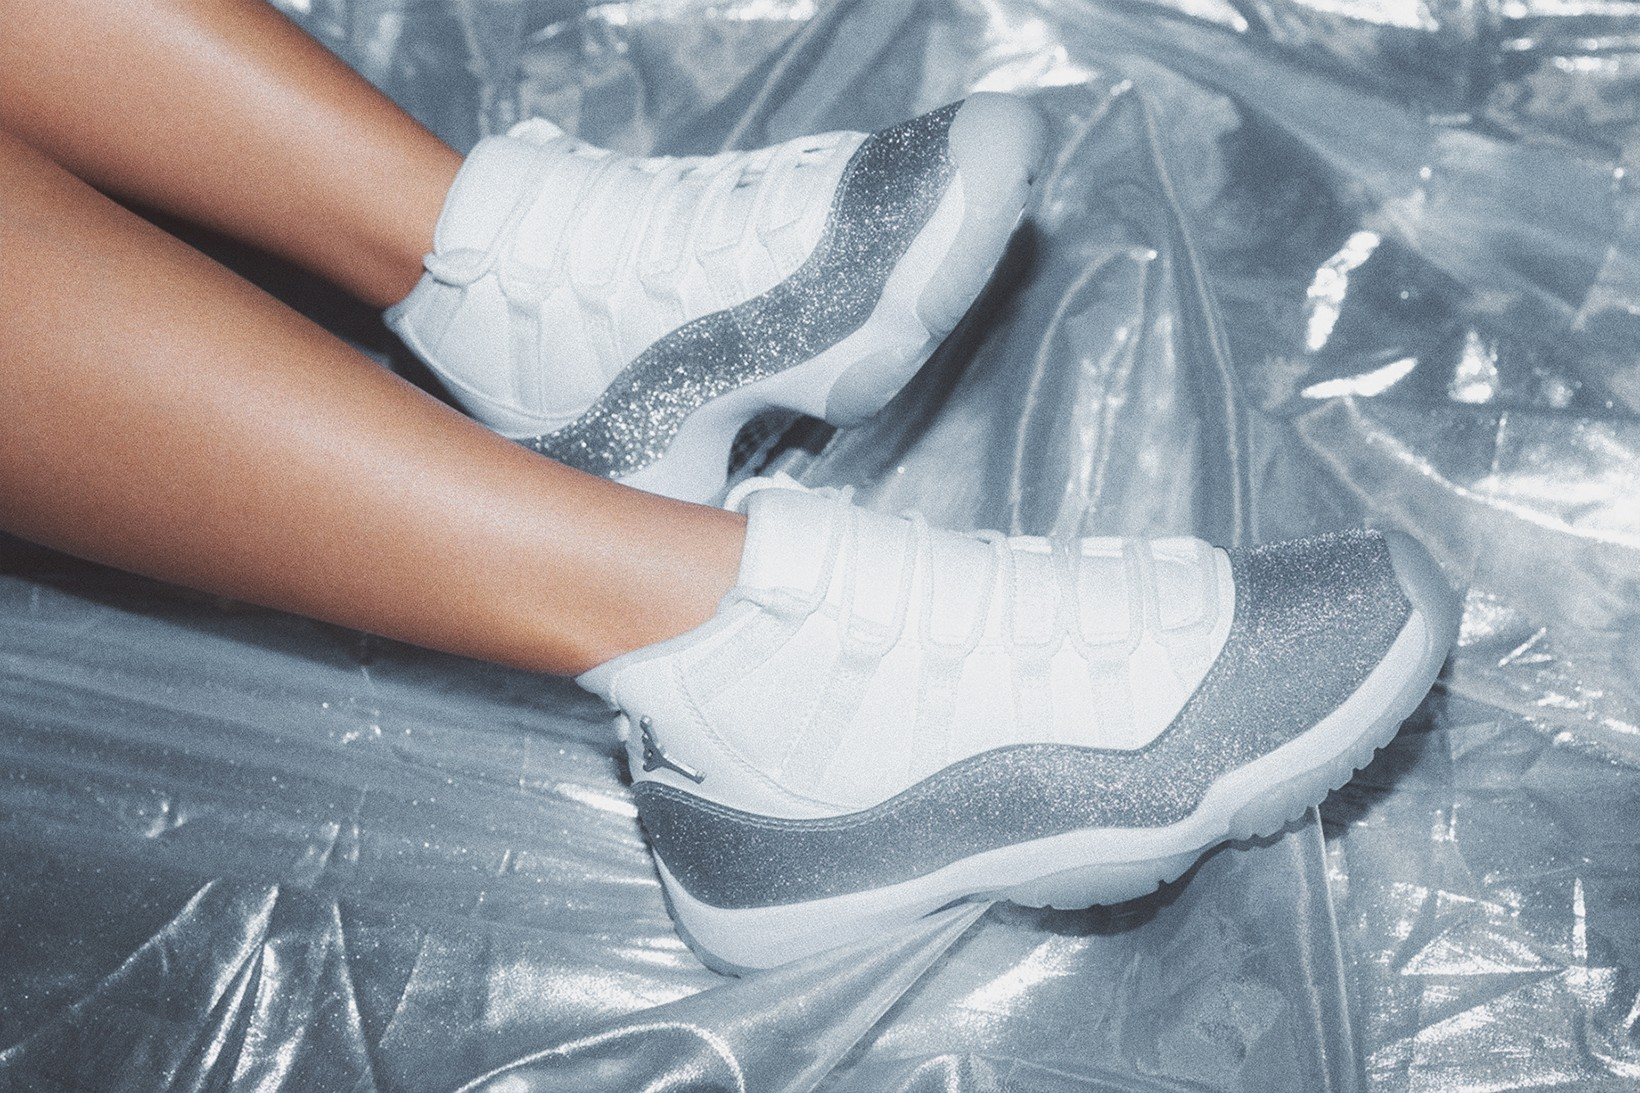 Nike Air Jordan 11 Metallic Silver On